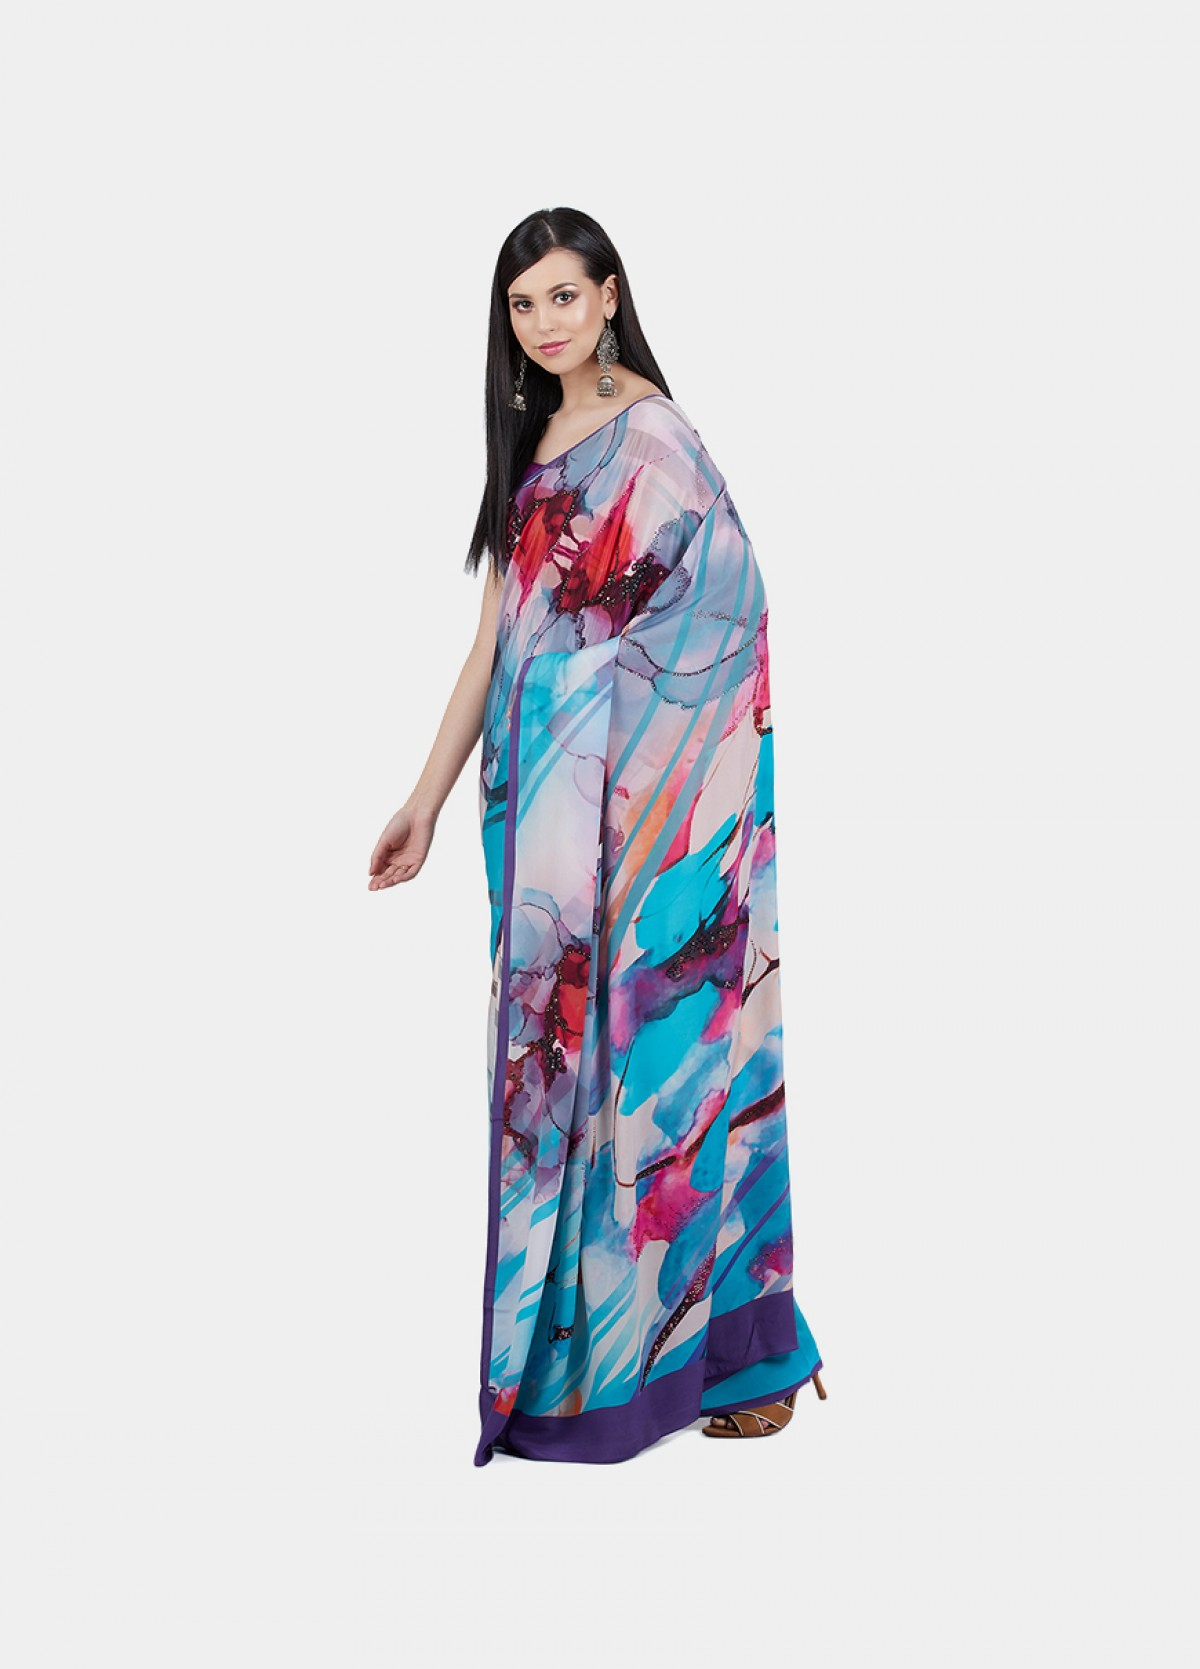 The Lush Sari